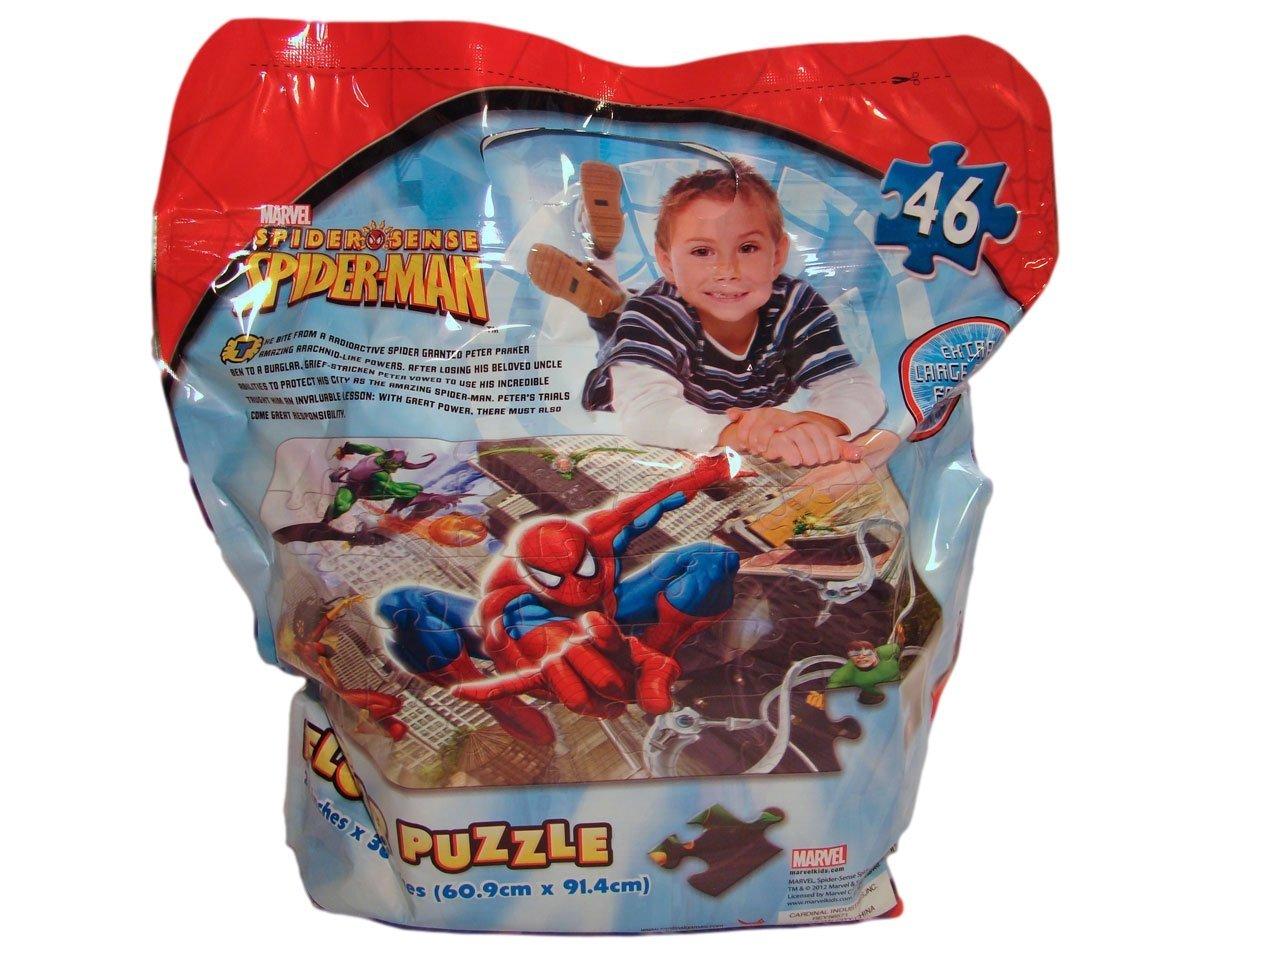 Spider Sense Spider-Man 46 Piece 3 Foot Floor Puzzle by Cardinal